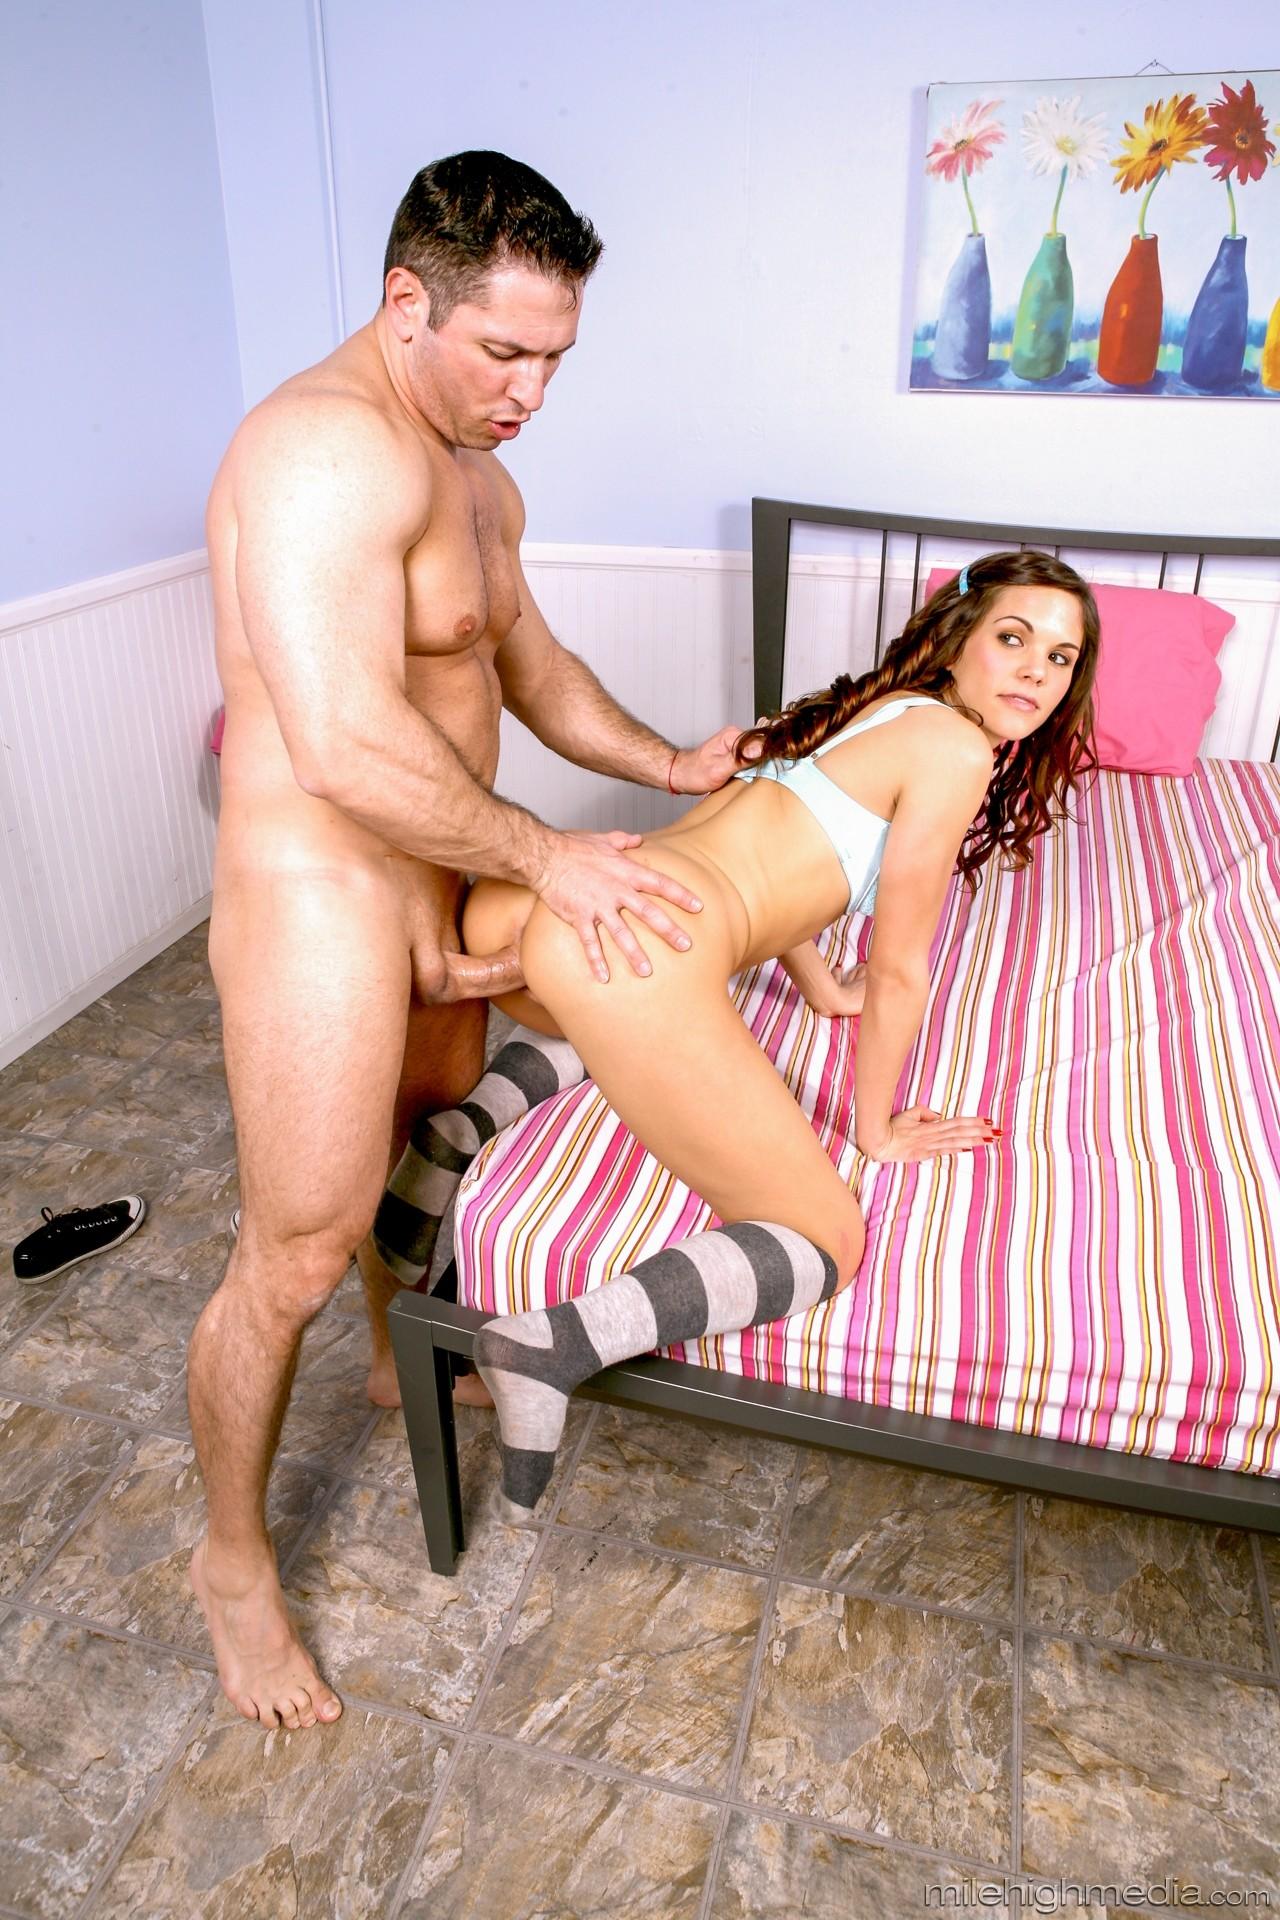 Teen pornstar elizabeth ann pics — pic 10